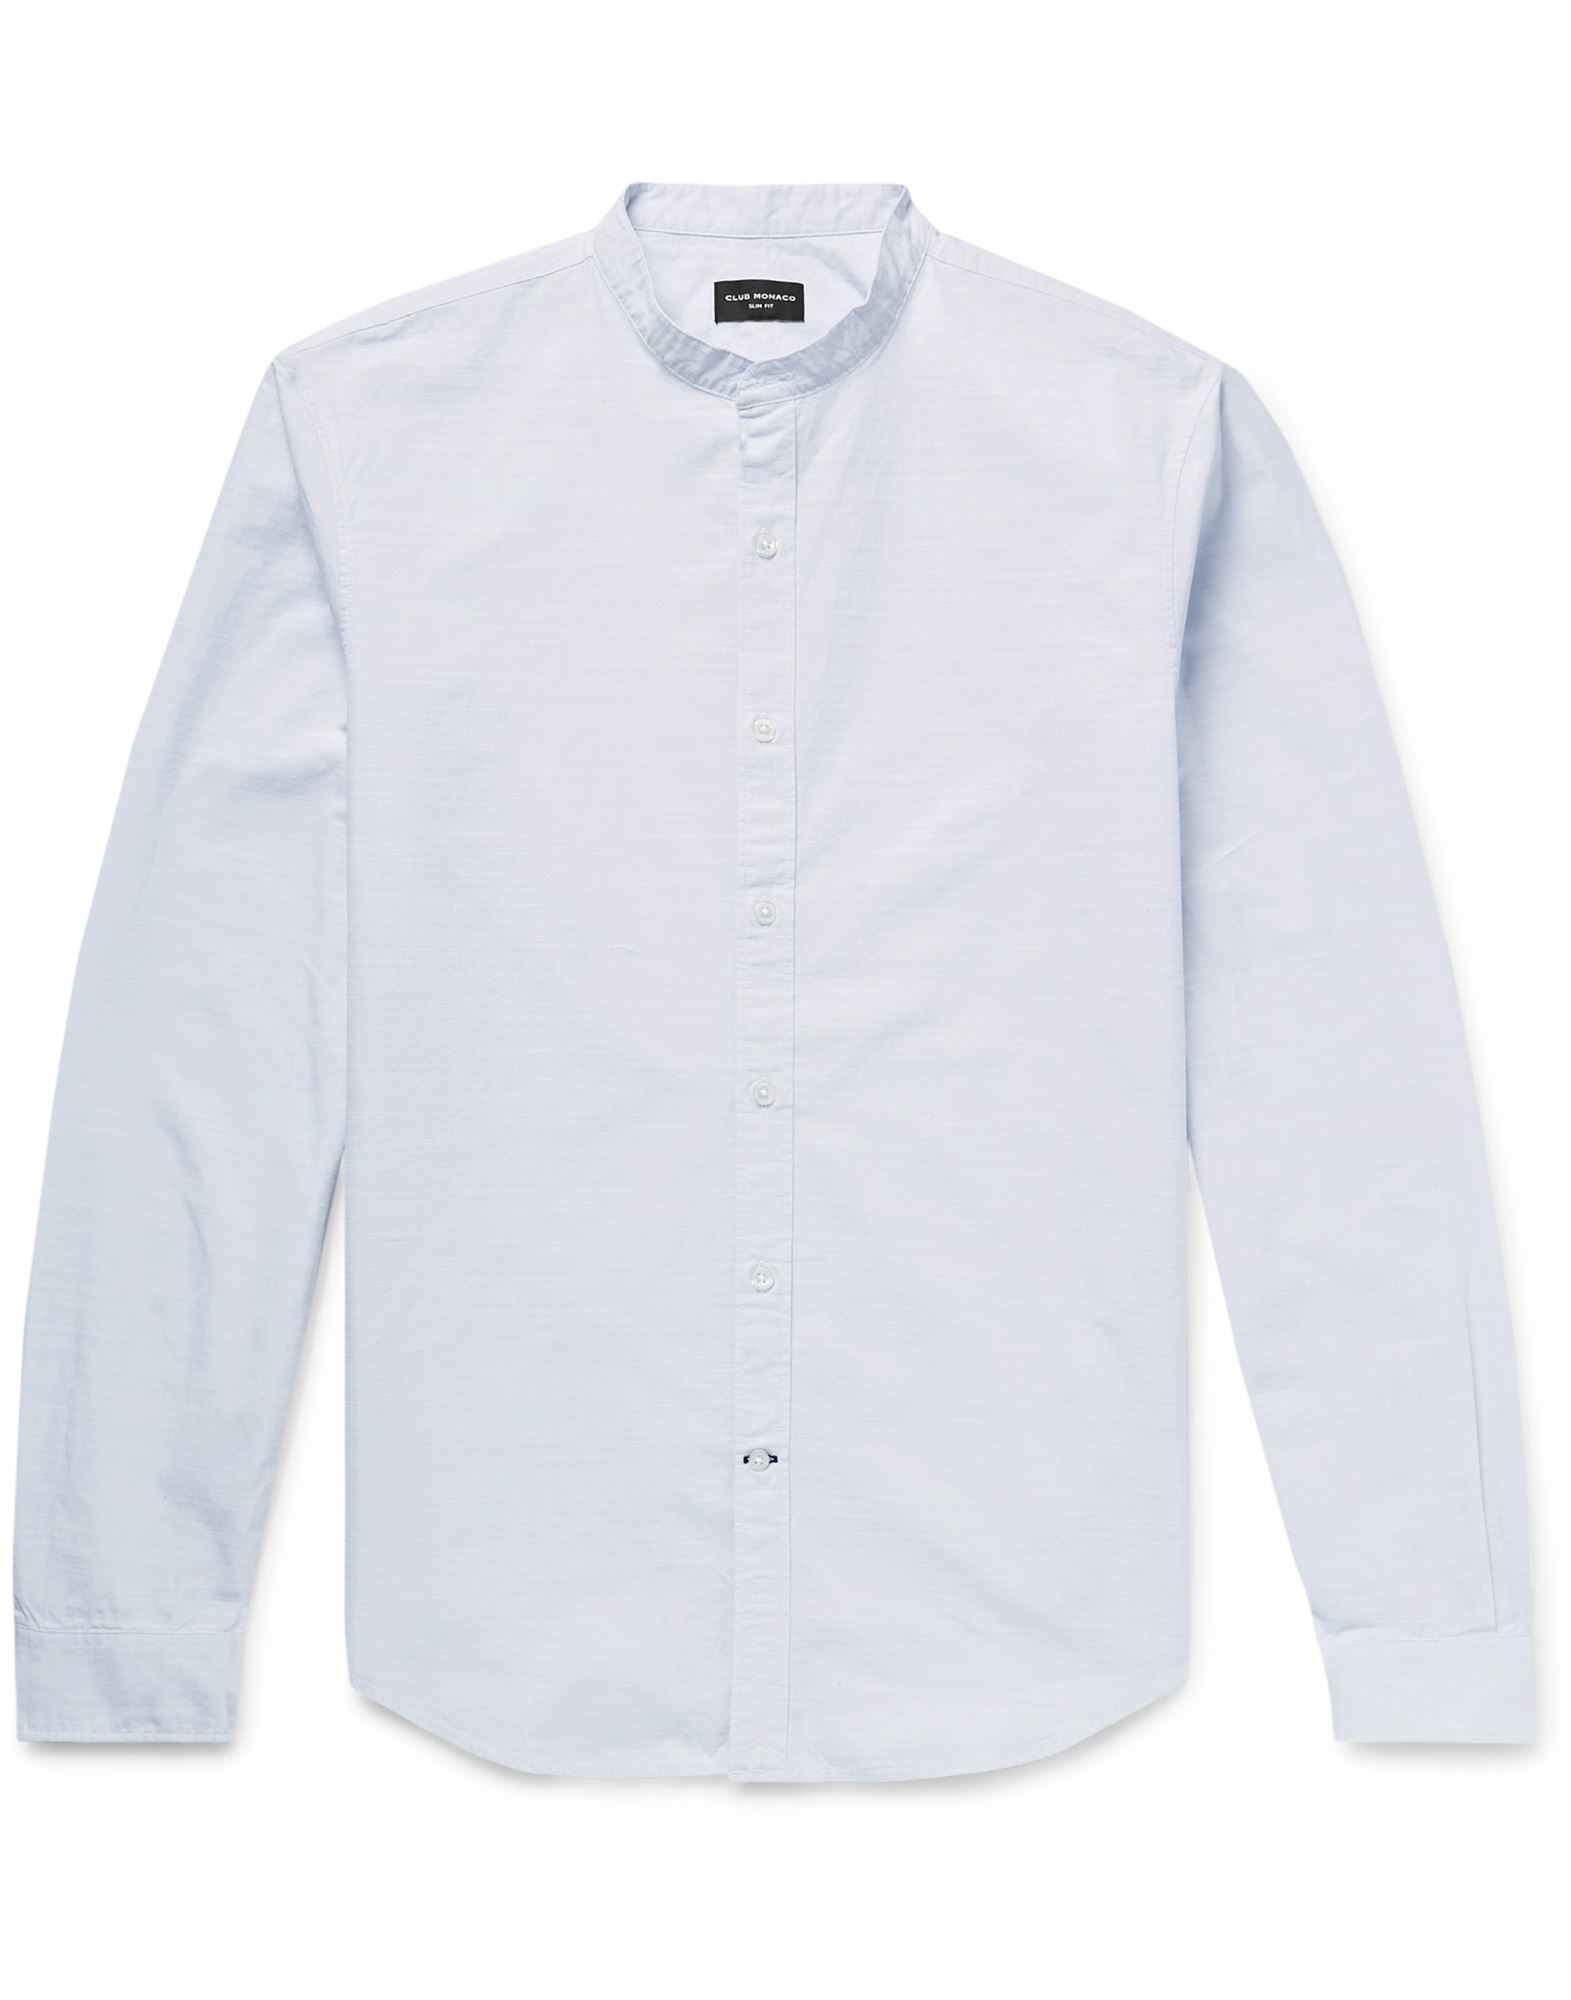 CLUB MONACO Shirts. plain weave, no appliqués, solid color, front closure, button closing, long sleeves, buttoned cuffs, mandarin collar, no pockets, slim fit. 100% Cotton